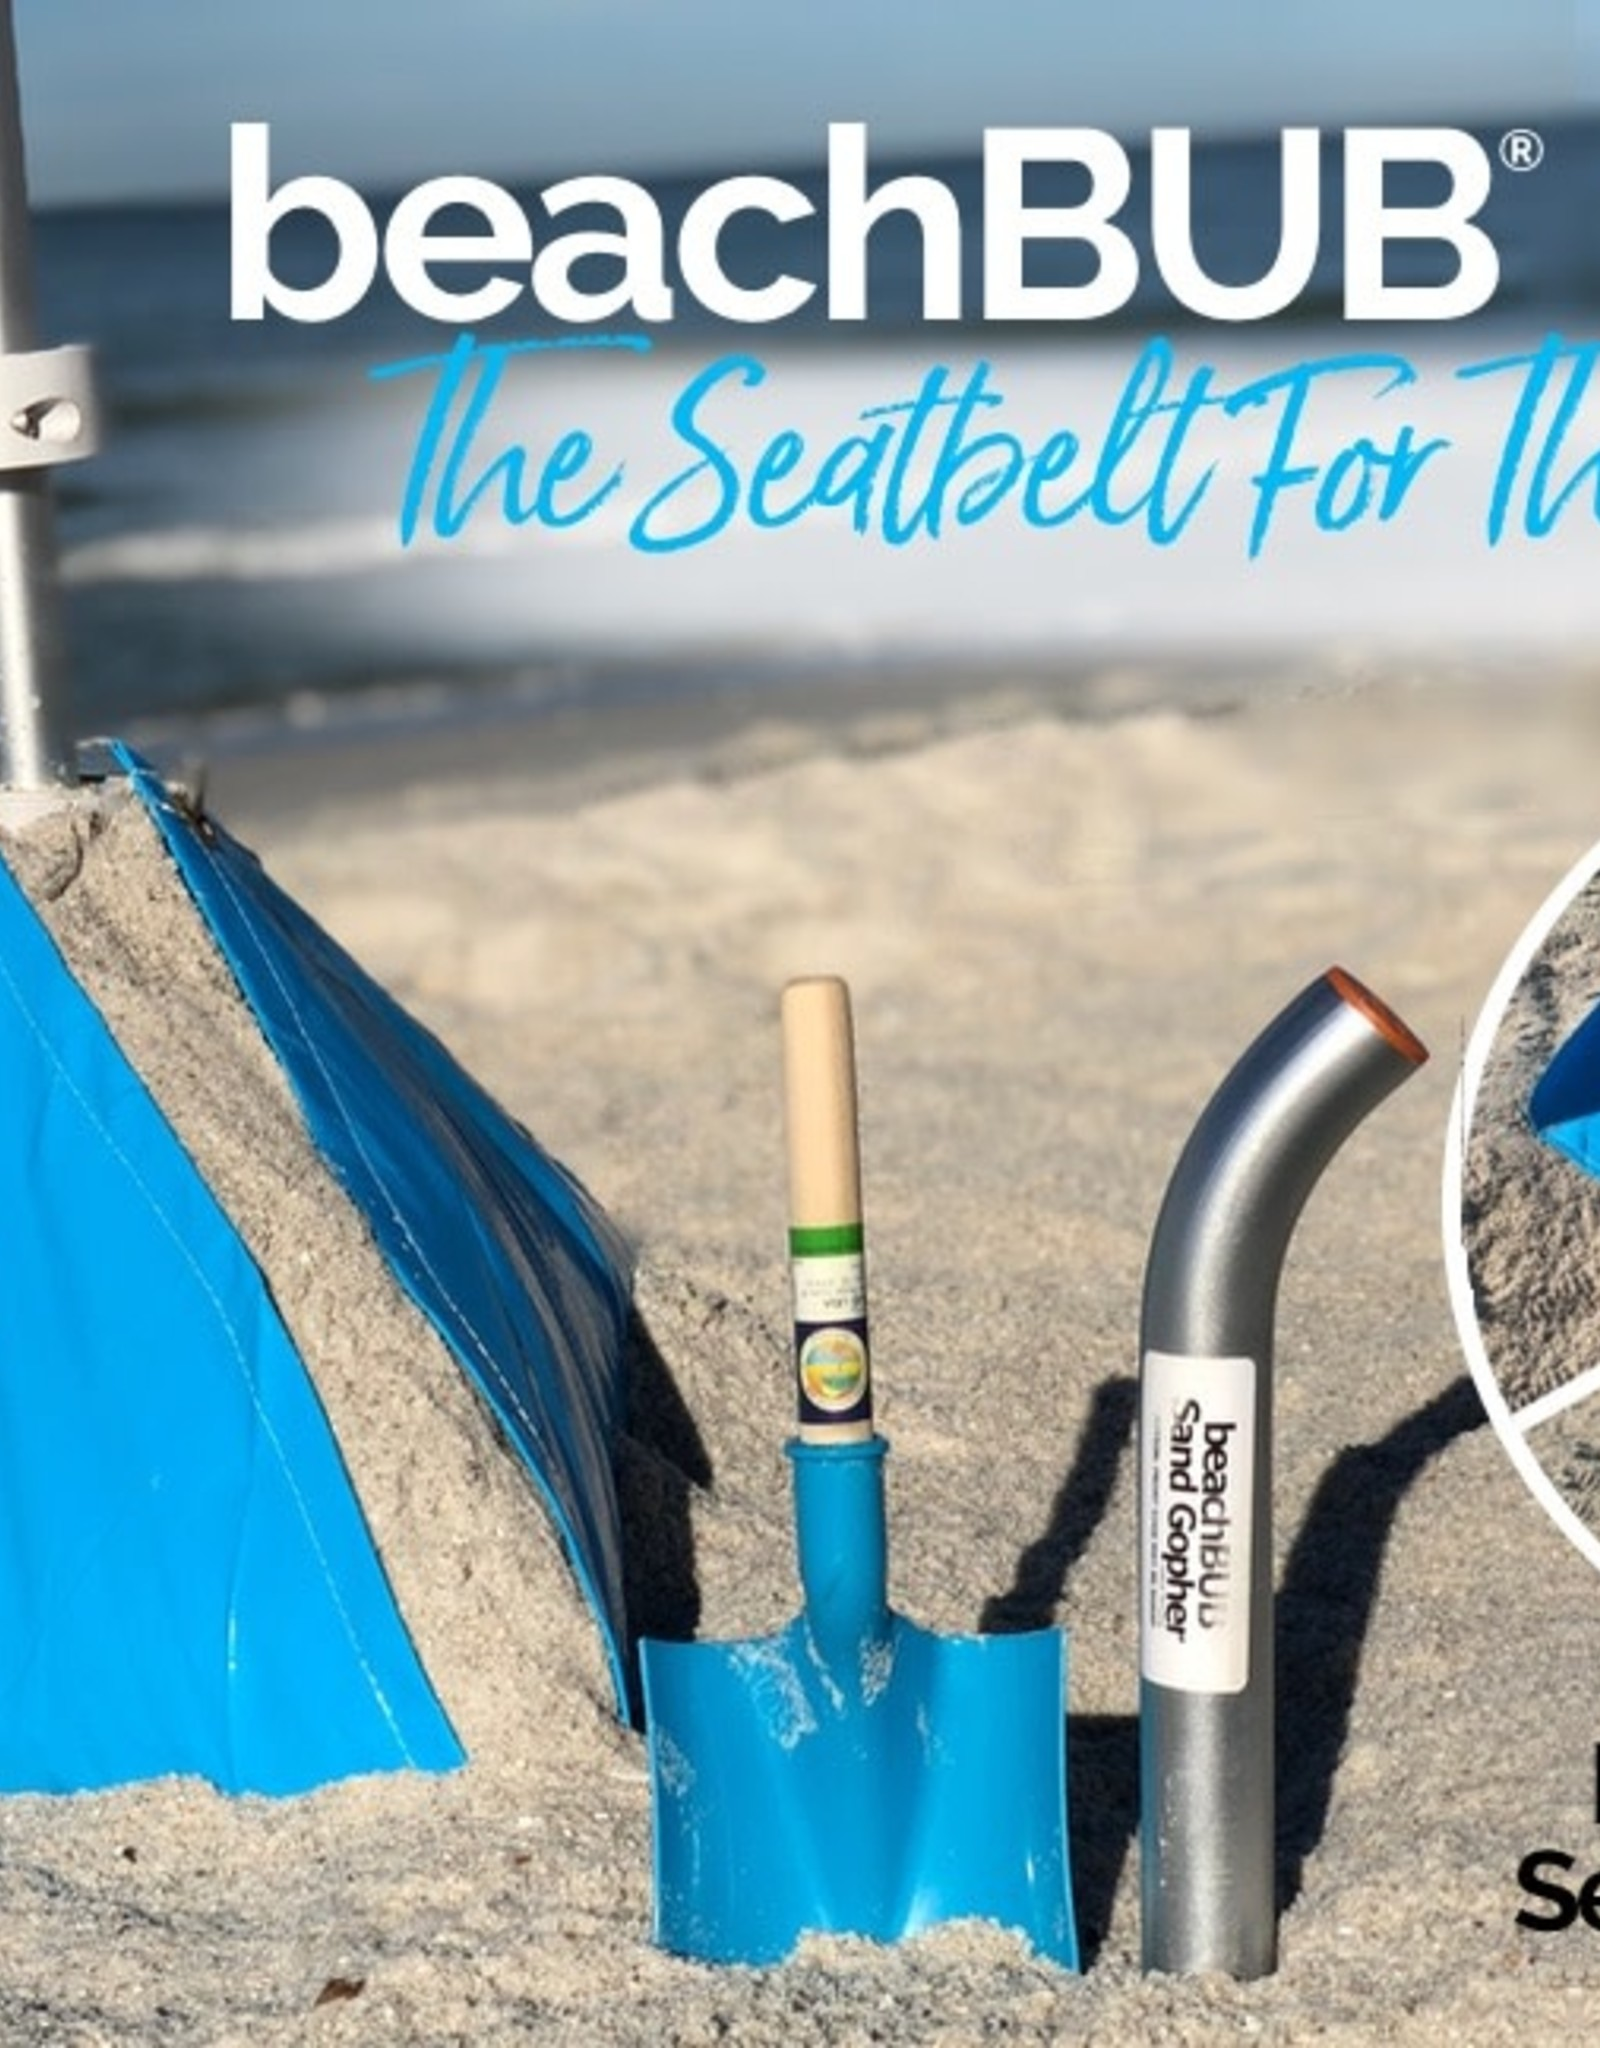 BEACH BUB ULTRA BEACH UMBRELLA BASE (GREEN)